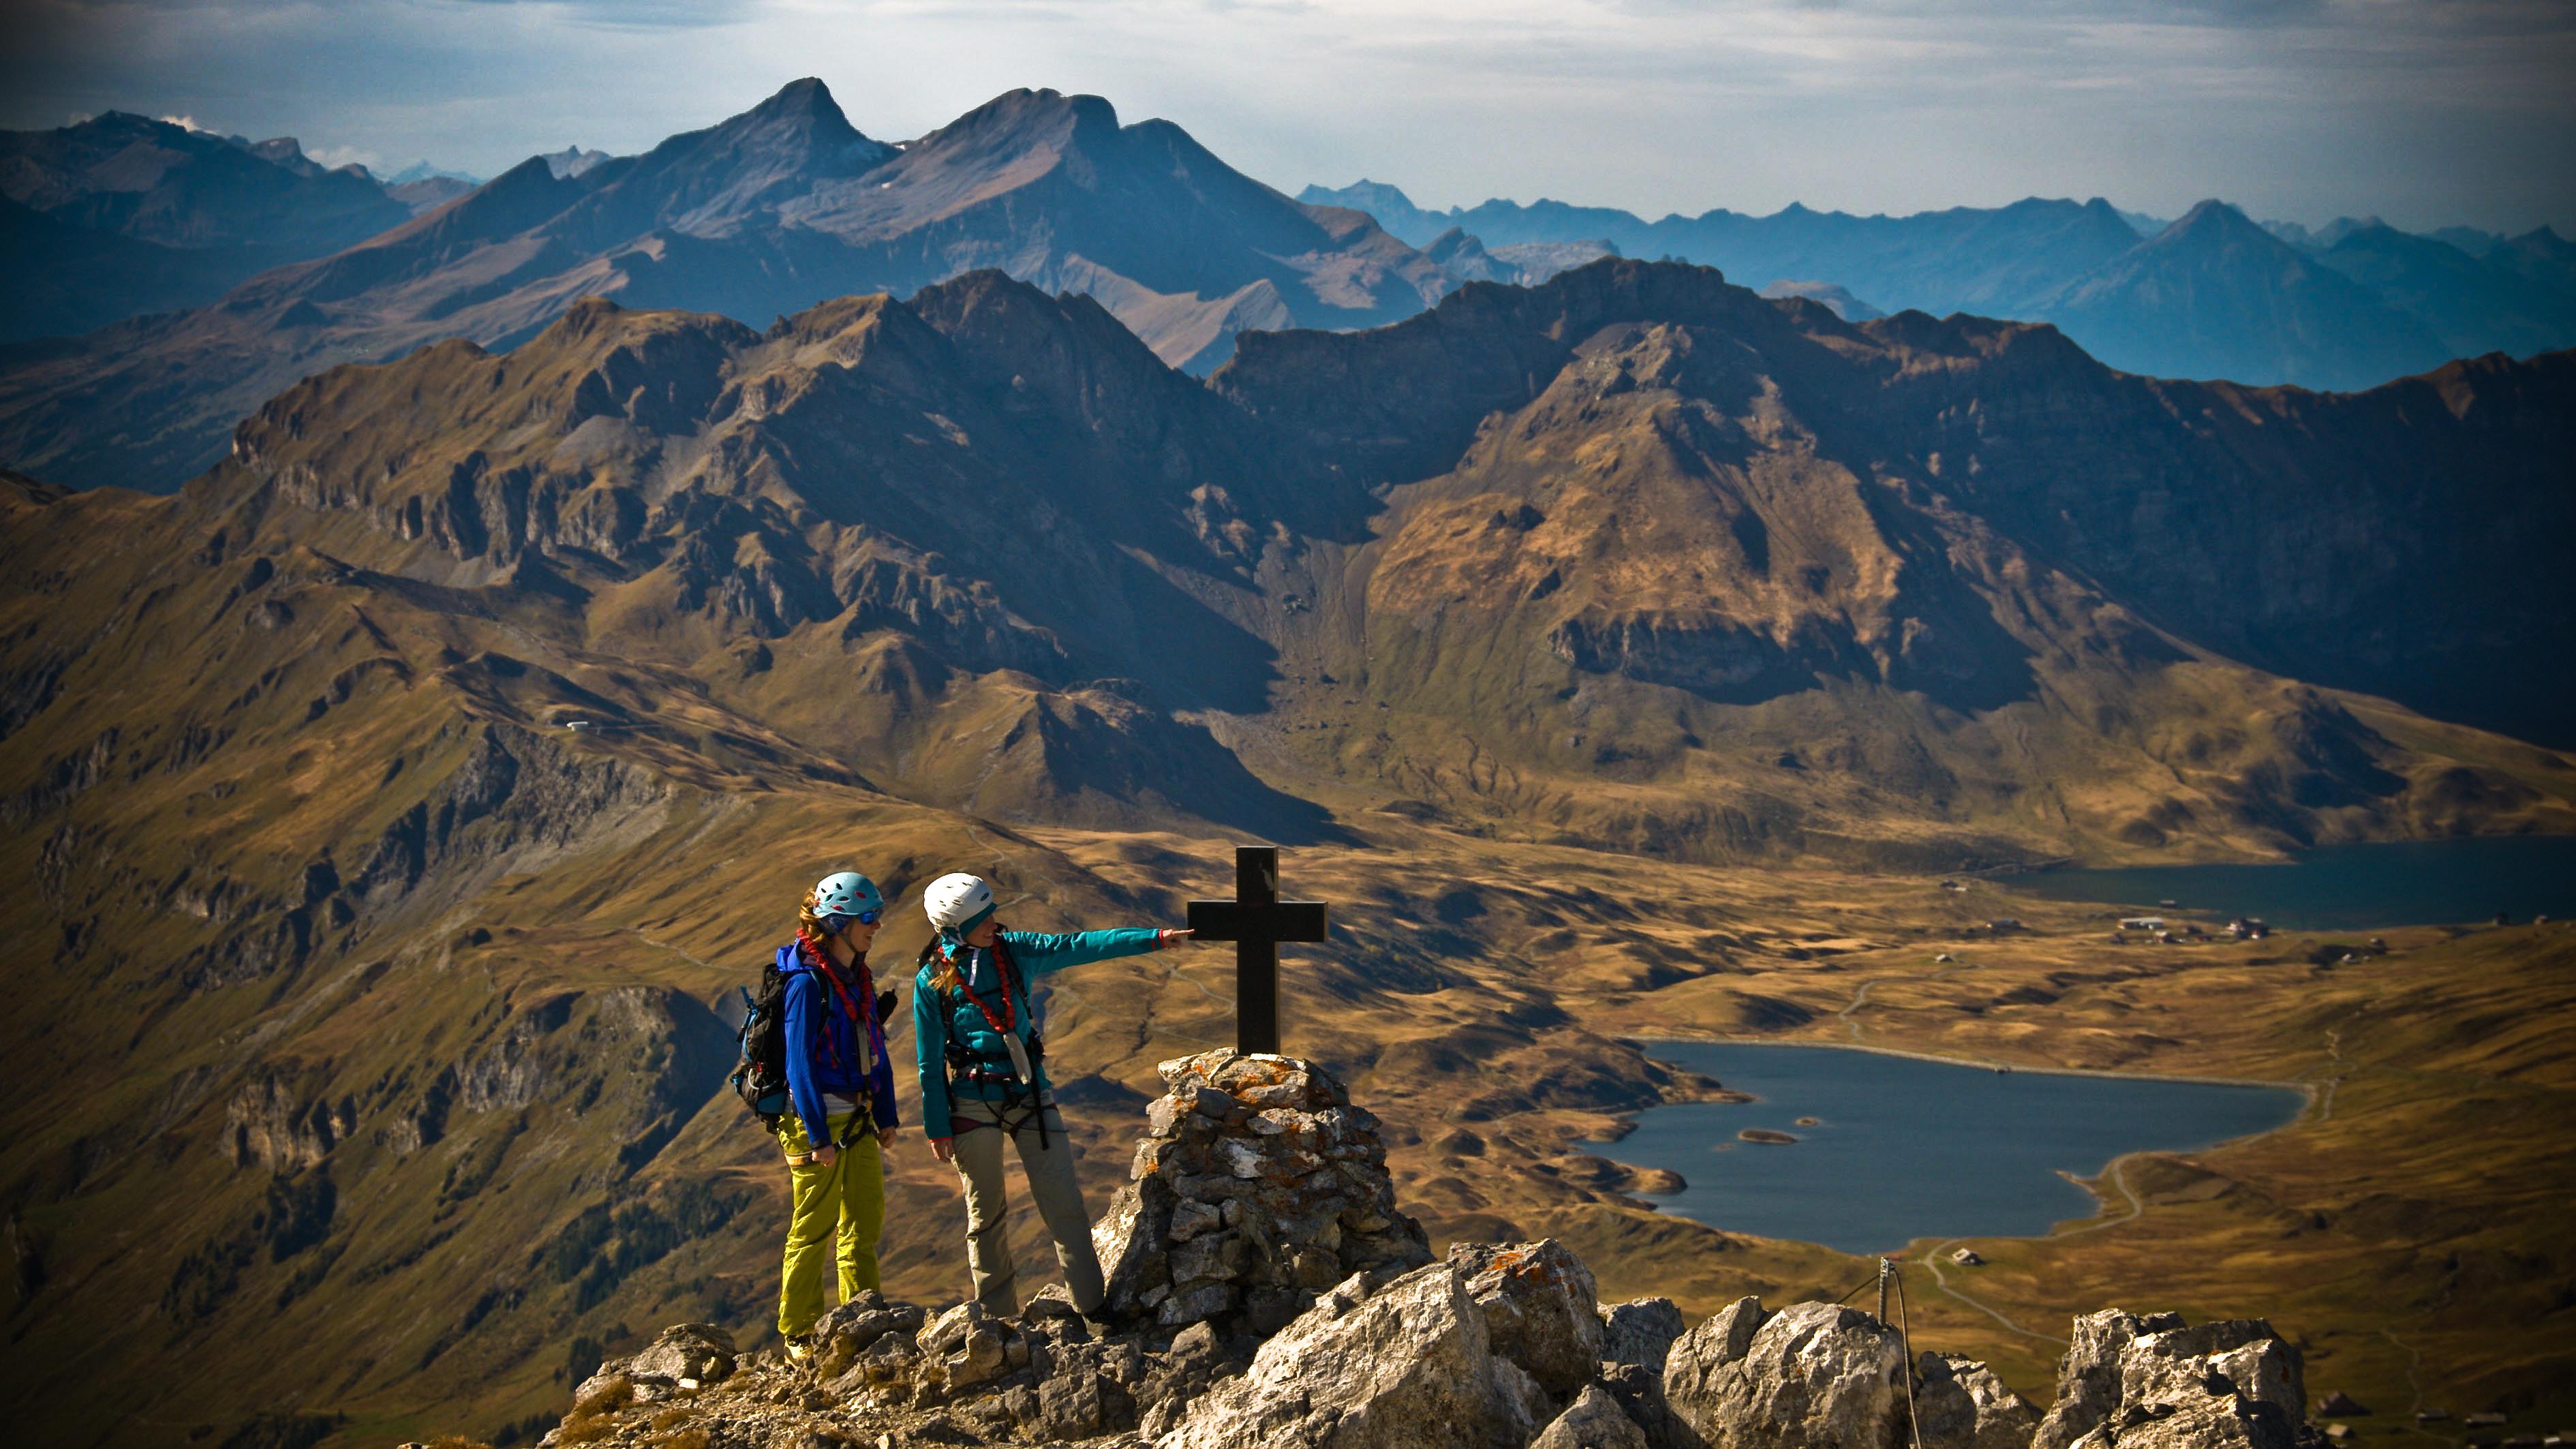 Klettersteig Graustock : Graustock u engelberg mountain guide